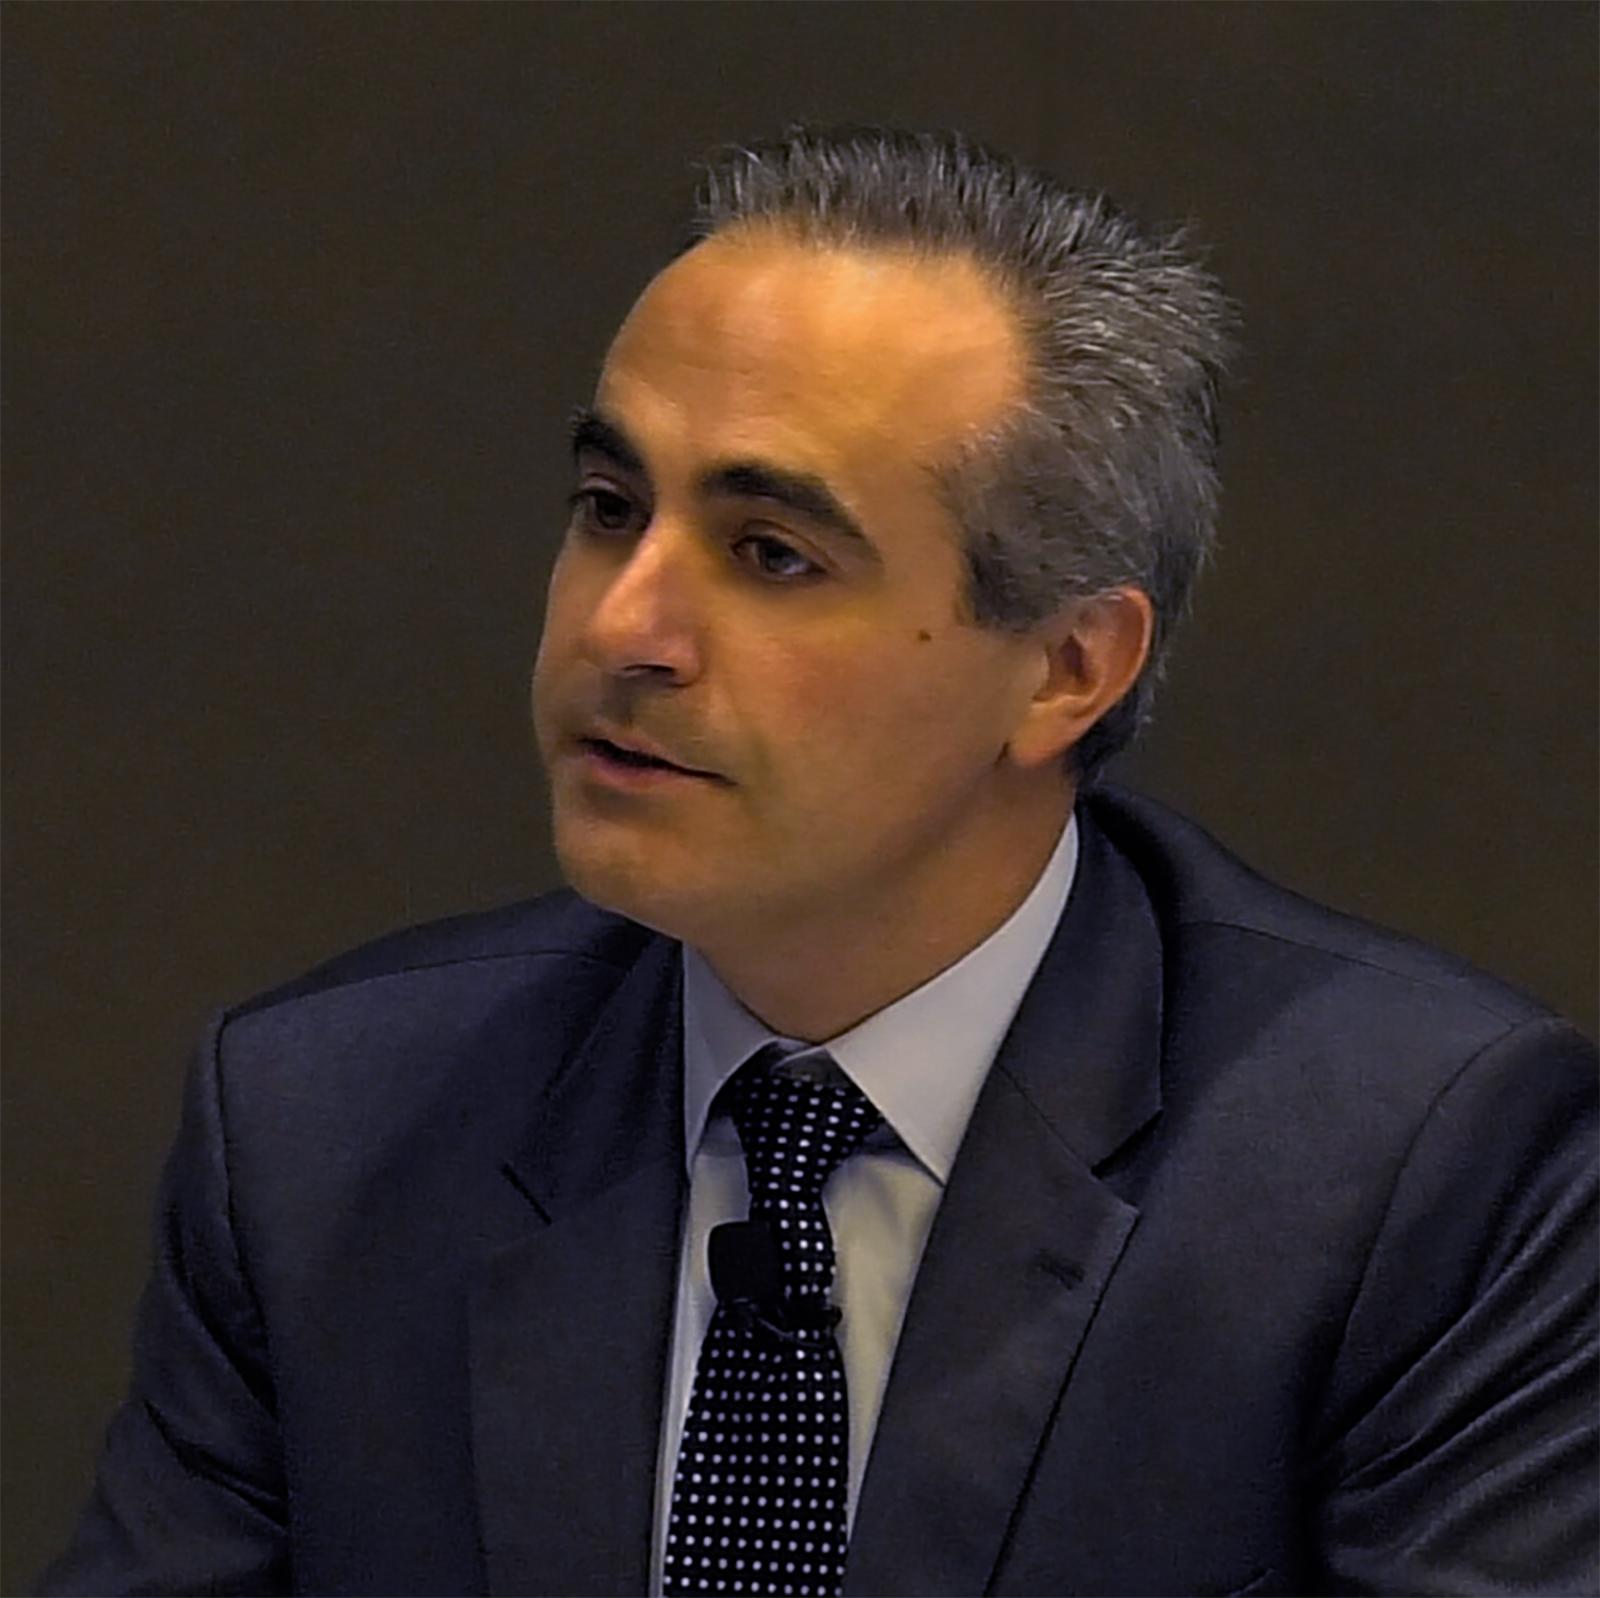 Stefano Marani - CEO of Renergen